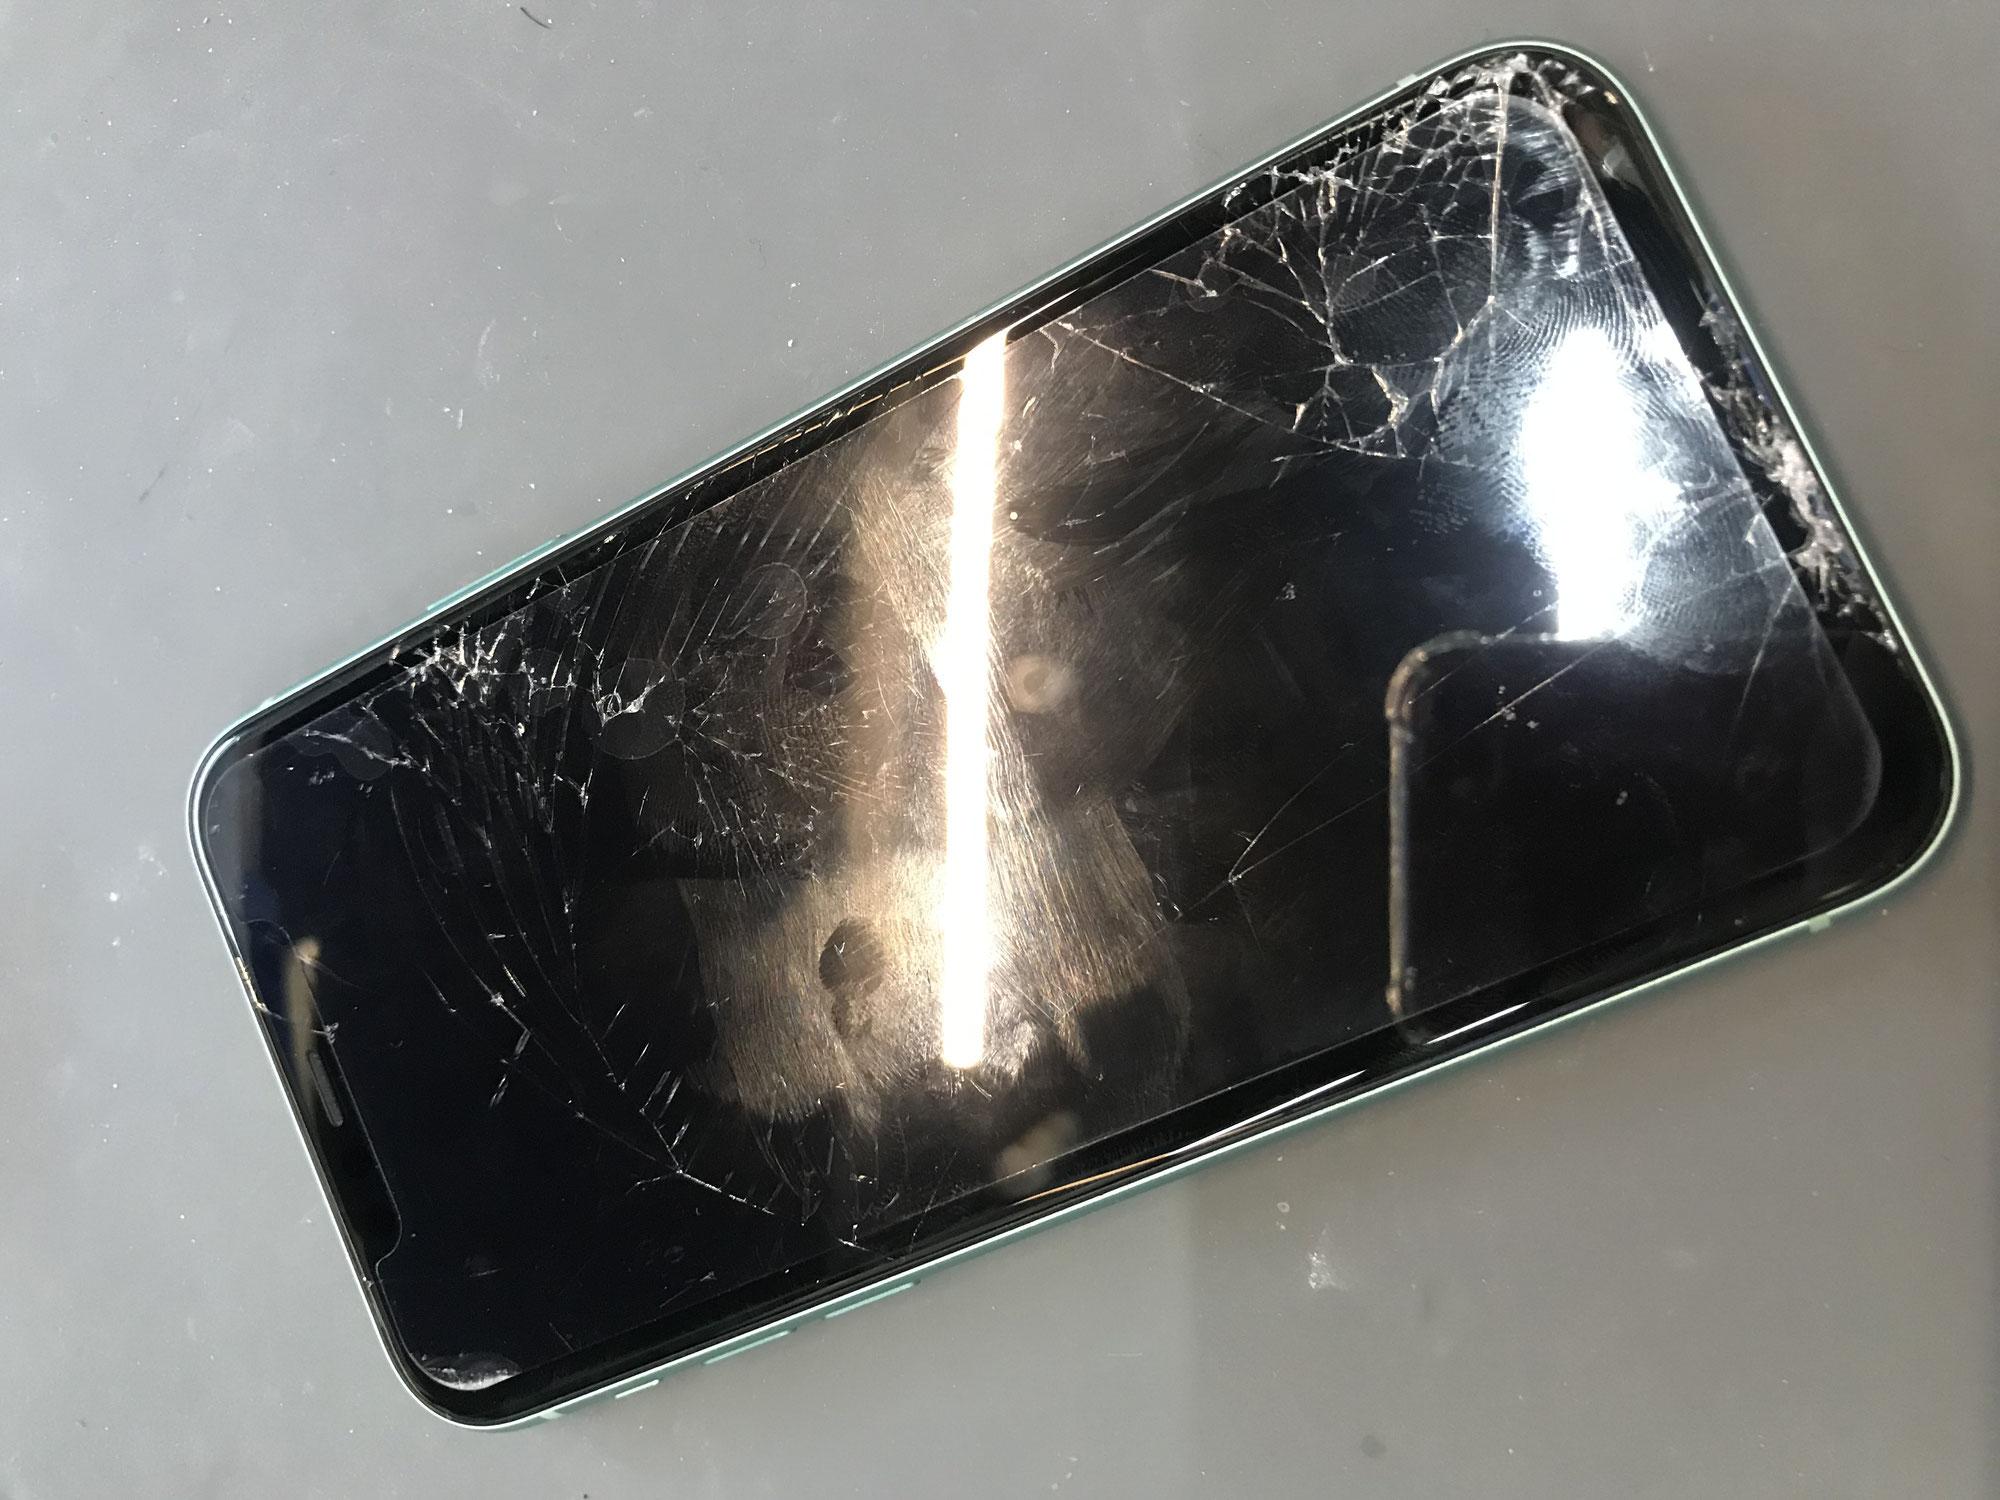 【iPhone 修理 所沢】埼玉最安級の激安価格で即日修理できる! データそのまま! 修理がとにかく安くて早い! バッテリー交換、ガラス割れ・液晶割れ修理、タッチ不良、水没 新所沢 所沢